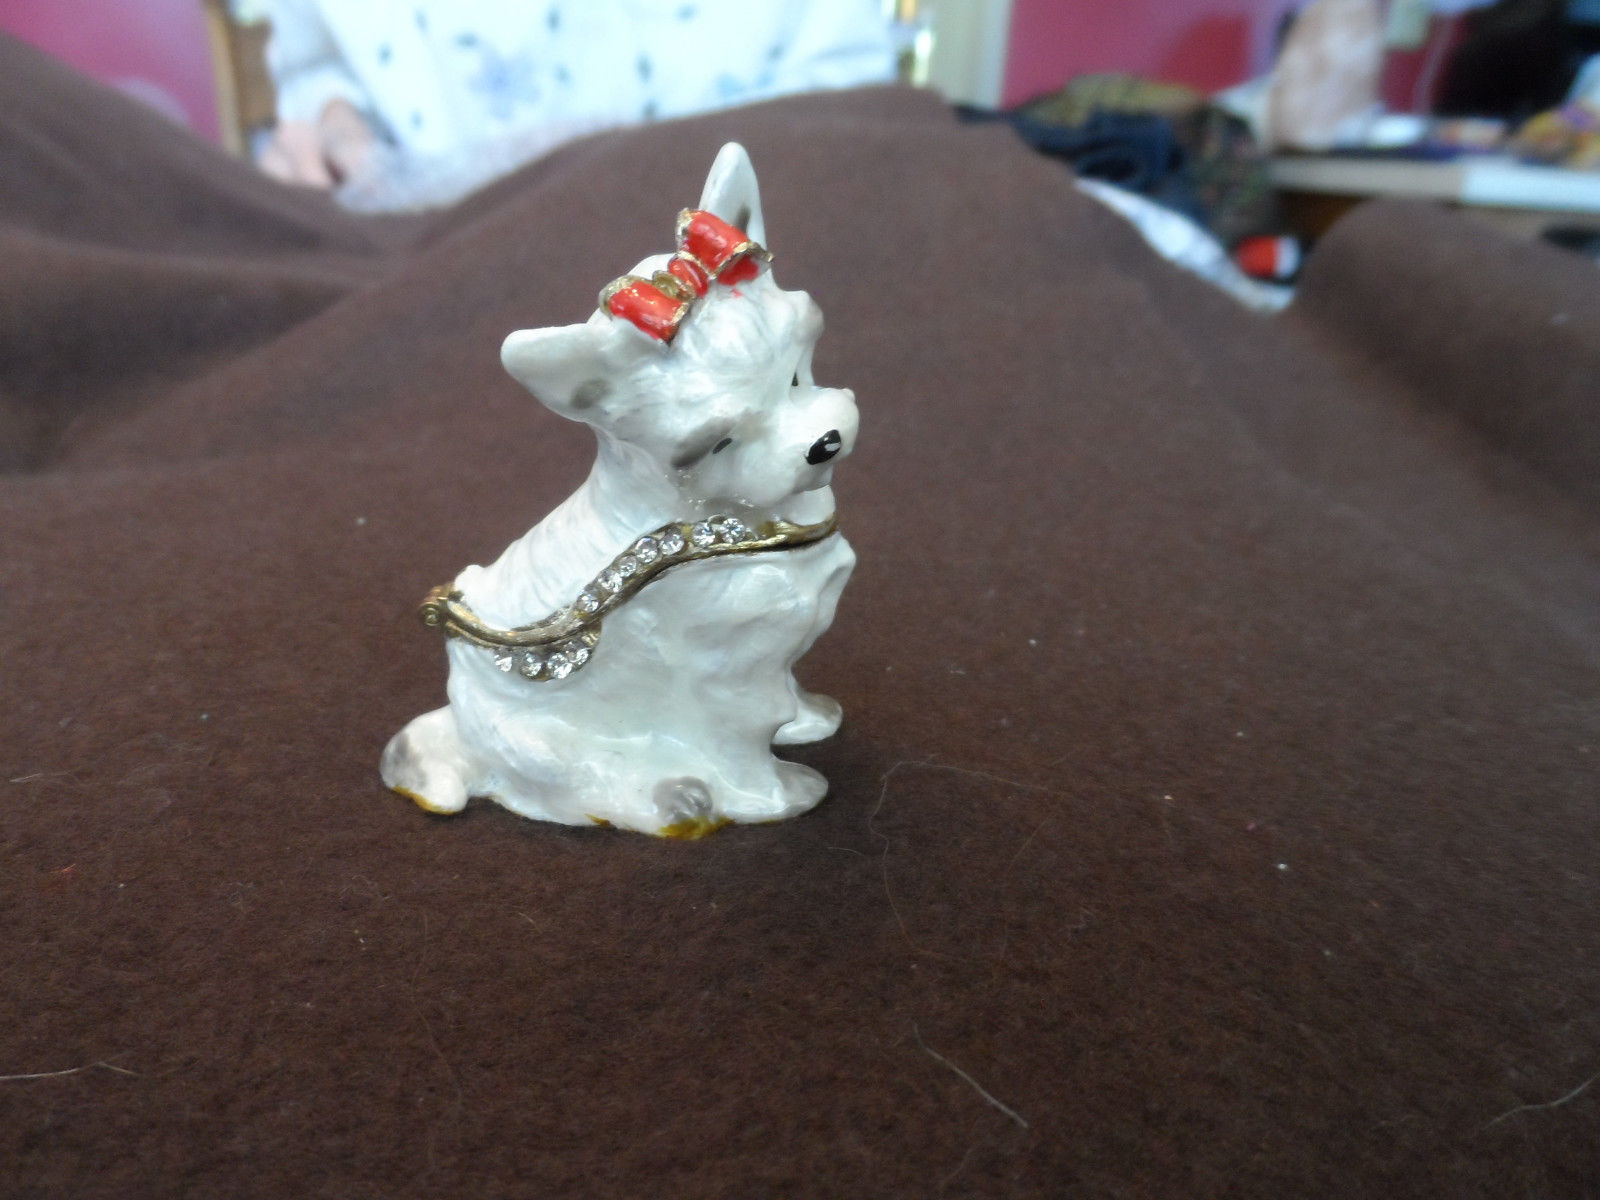 New metal hinged, jeweled trinket box - choice image 12